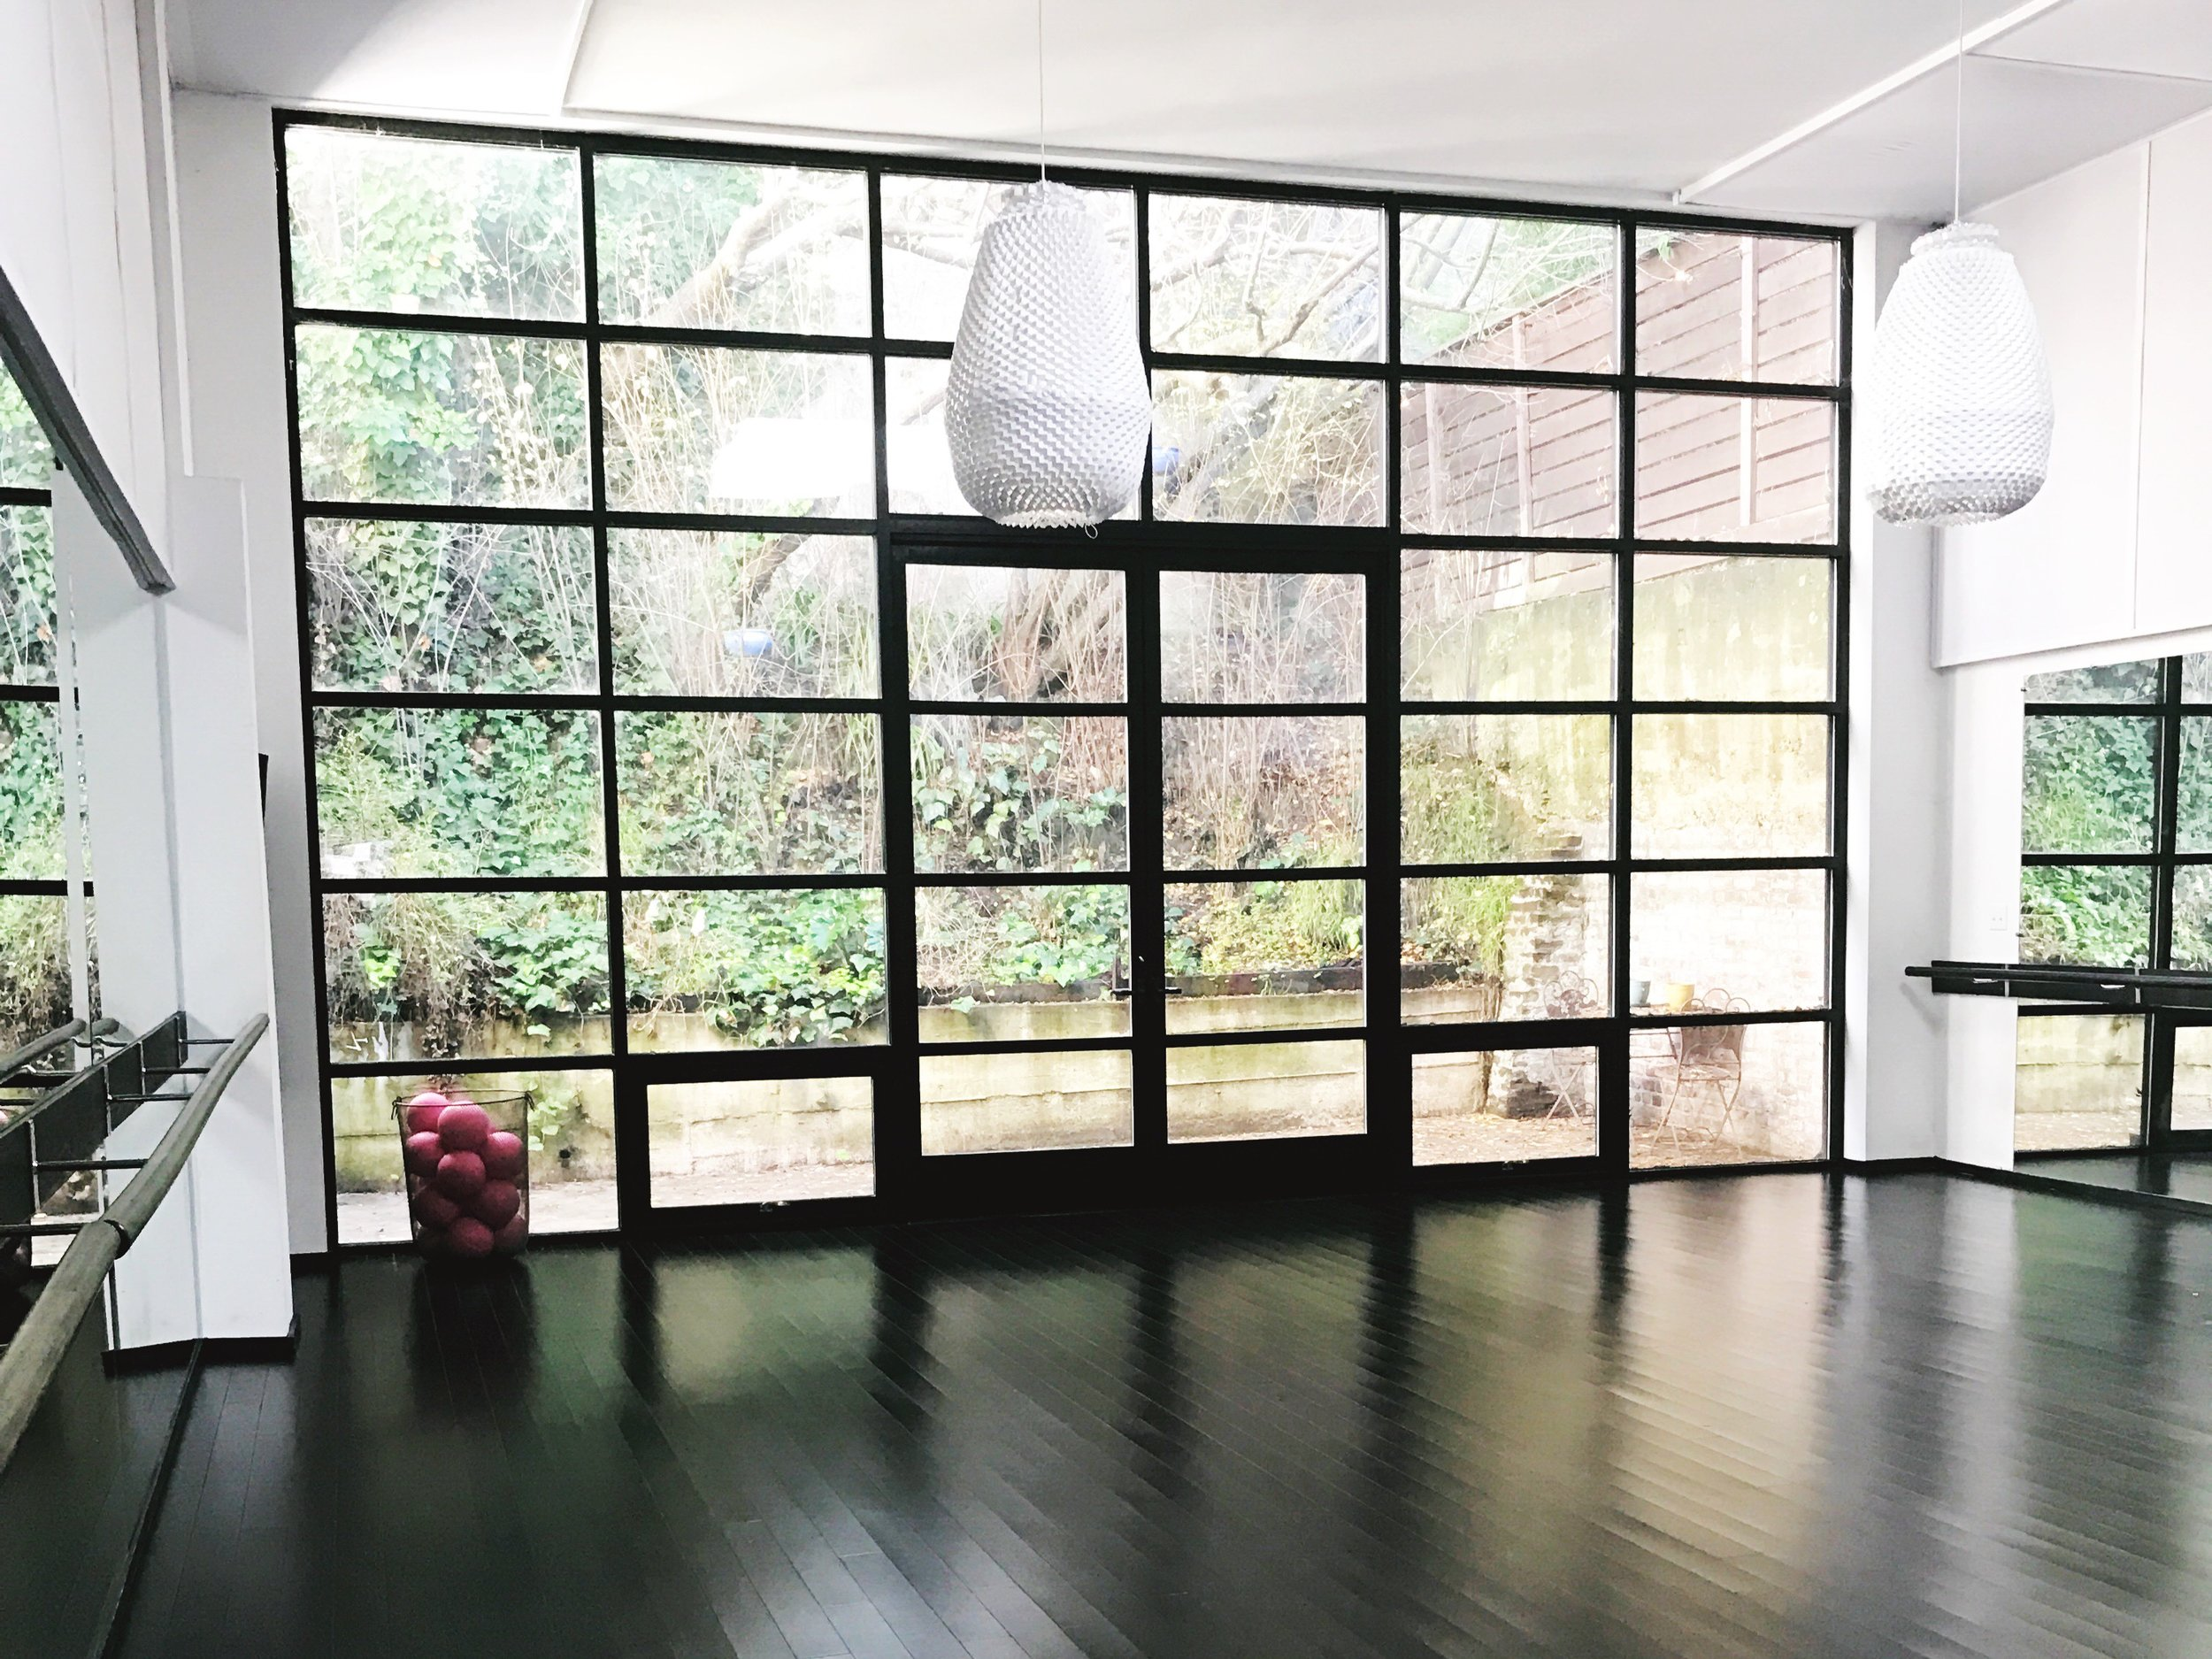 Pop Physique barre studio in San Francisco